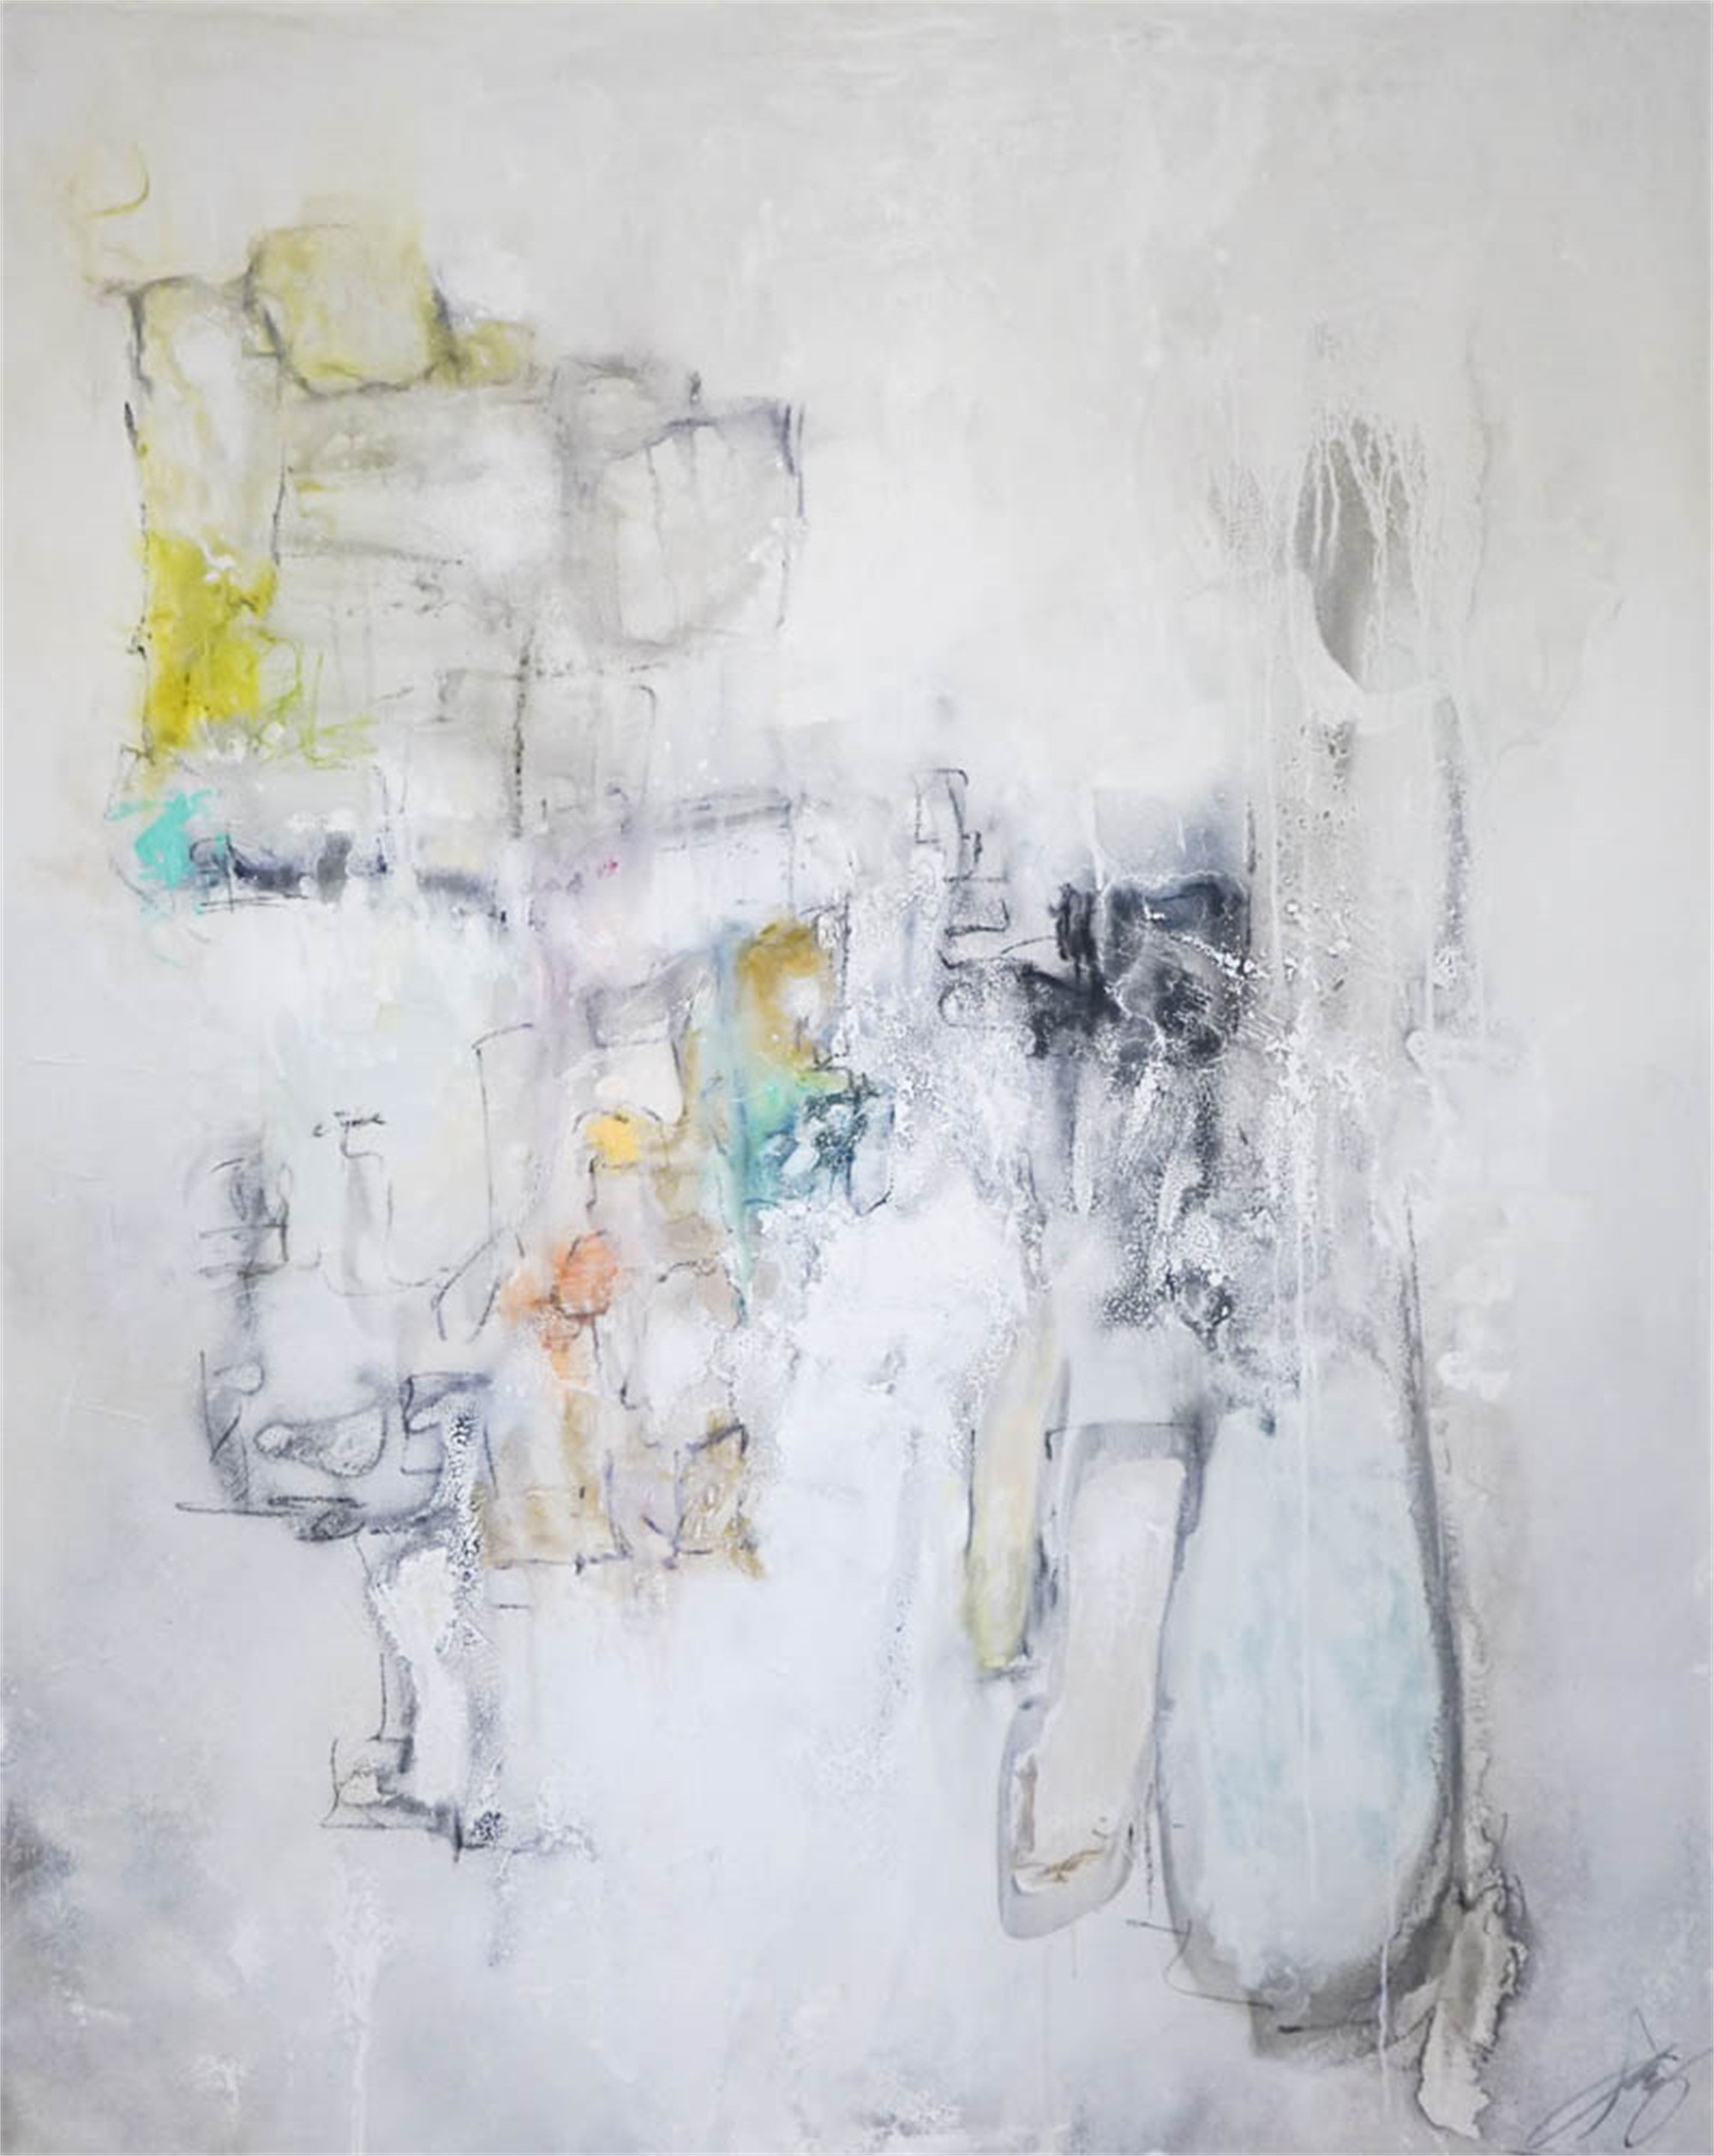 Blurred Sobriety by Amy Gordon